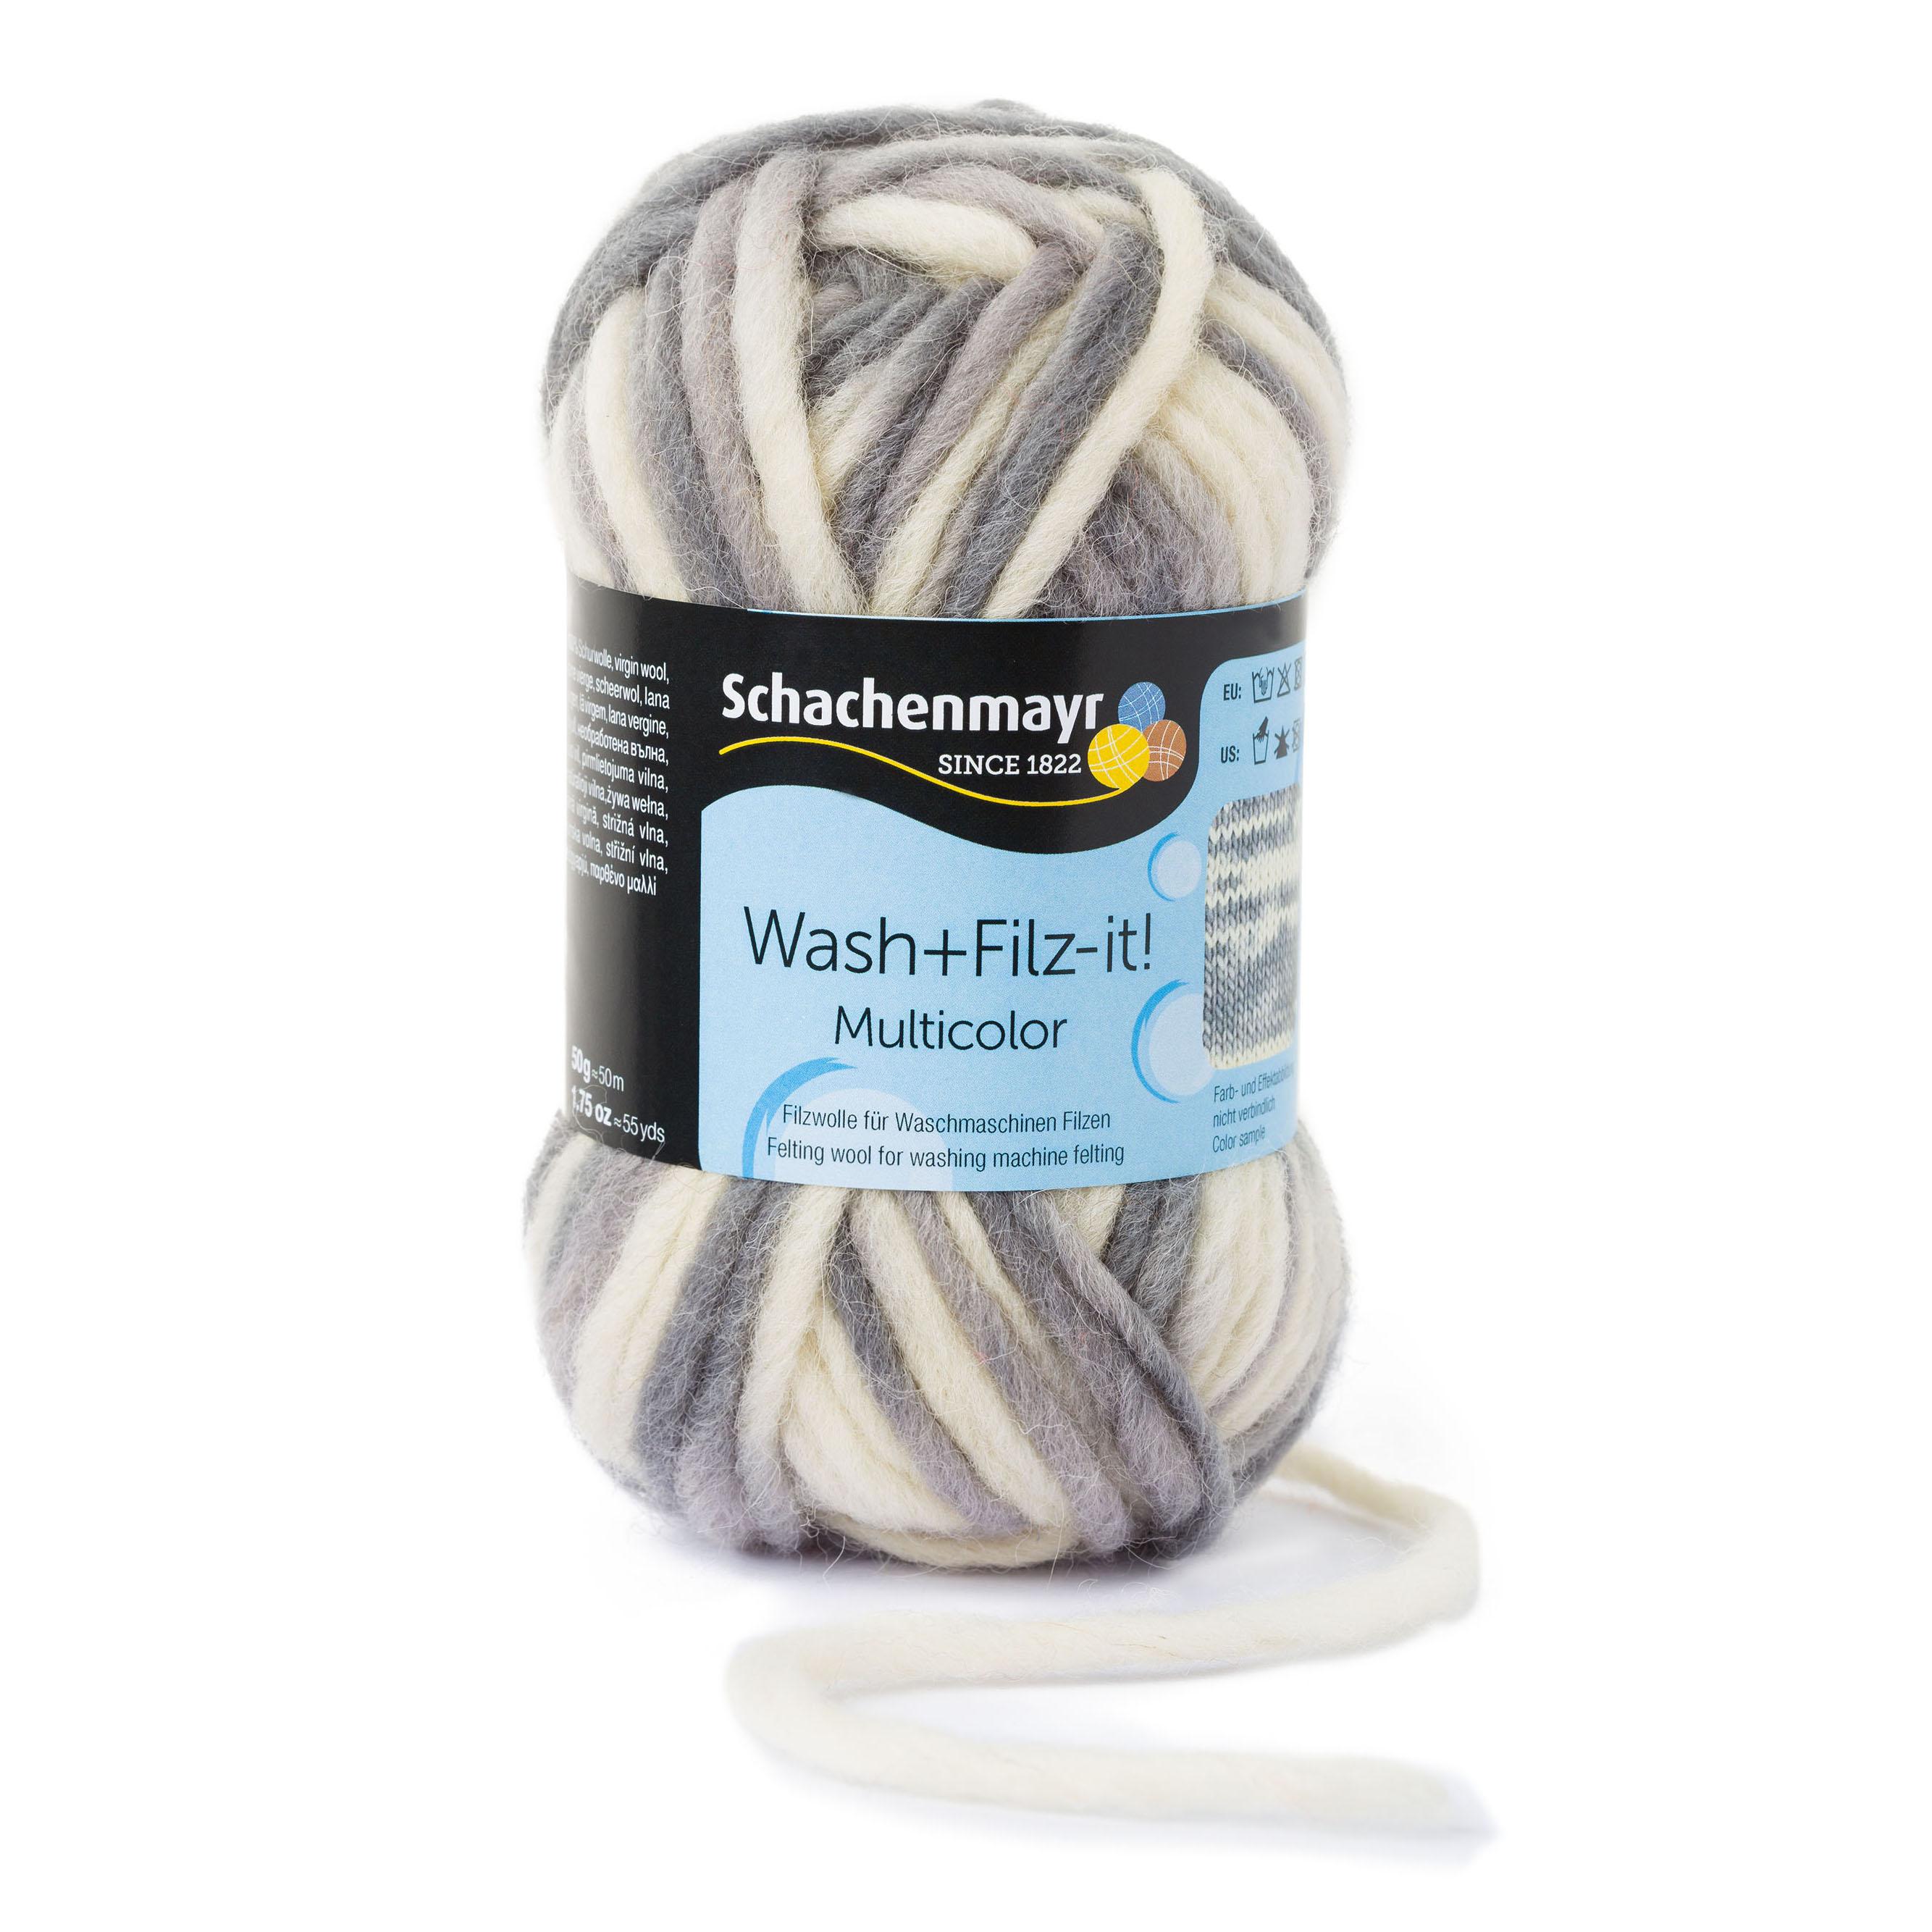 fc69d3344 Wash+Filz-it! multicolor | Schachenmayr